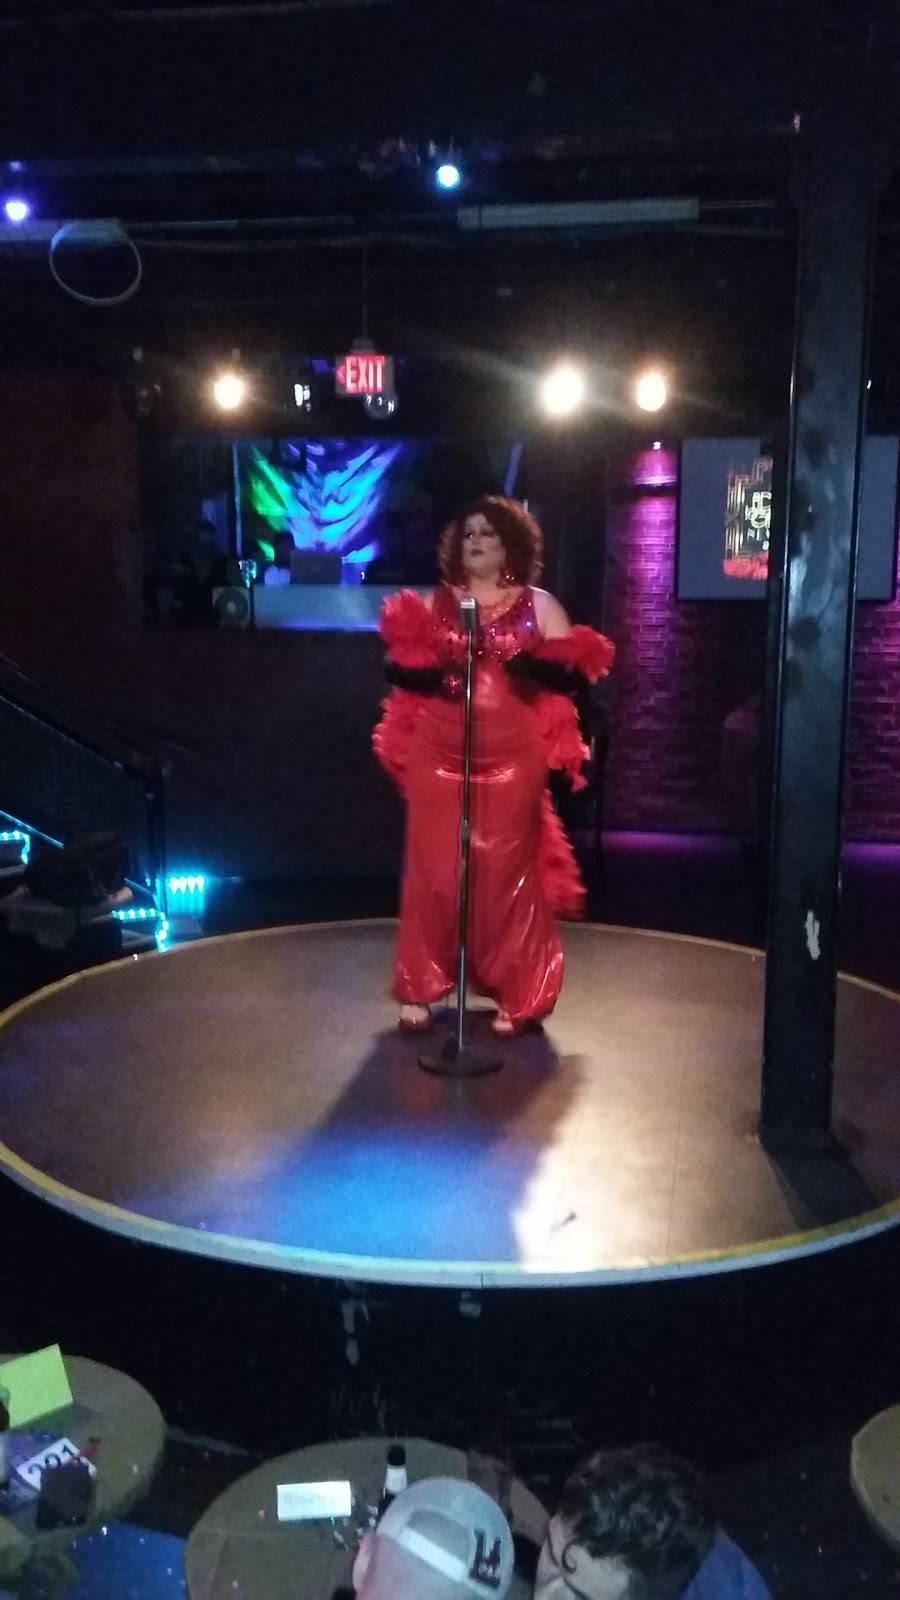 Bounce Nightclub Hinge Lounge | night club | 2814 Detroit Ave, Cleveland, OH 44113, USA | 2166960831 OR +1 216-696-0831